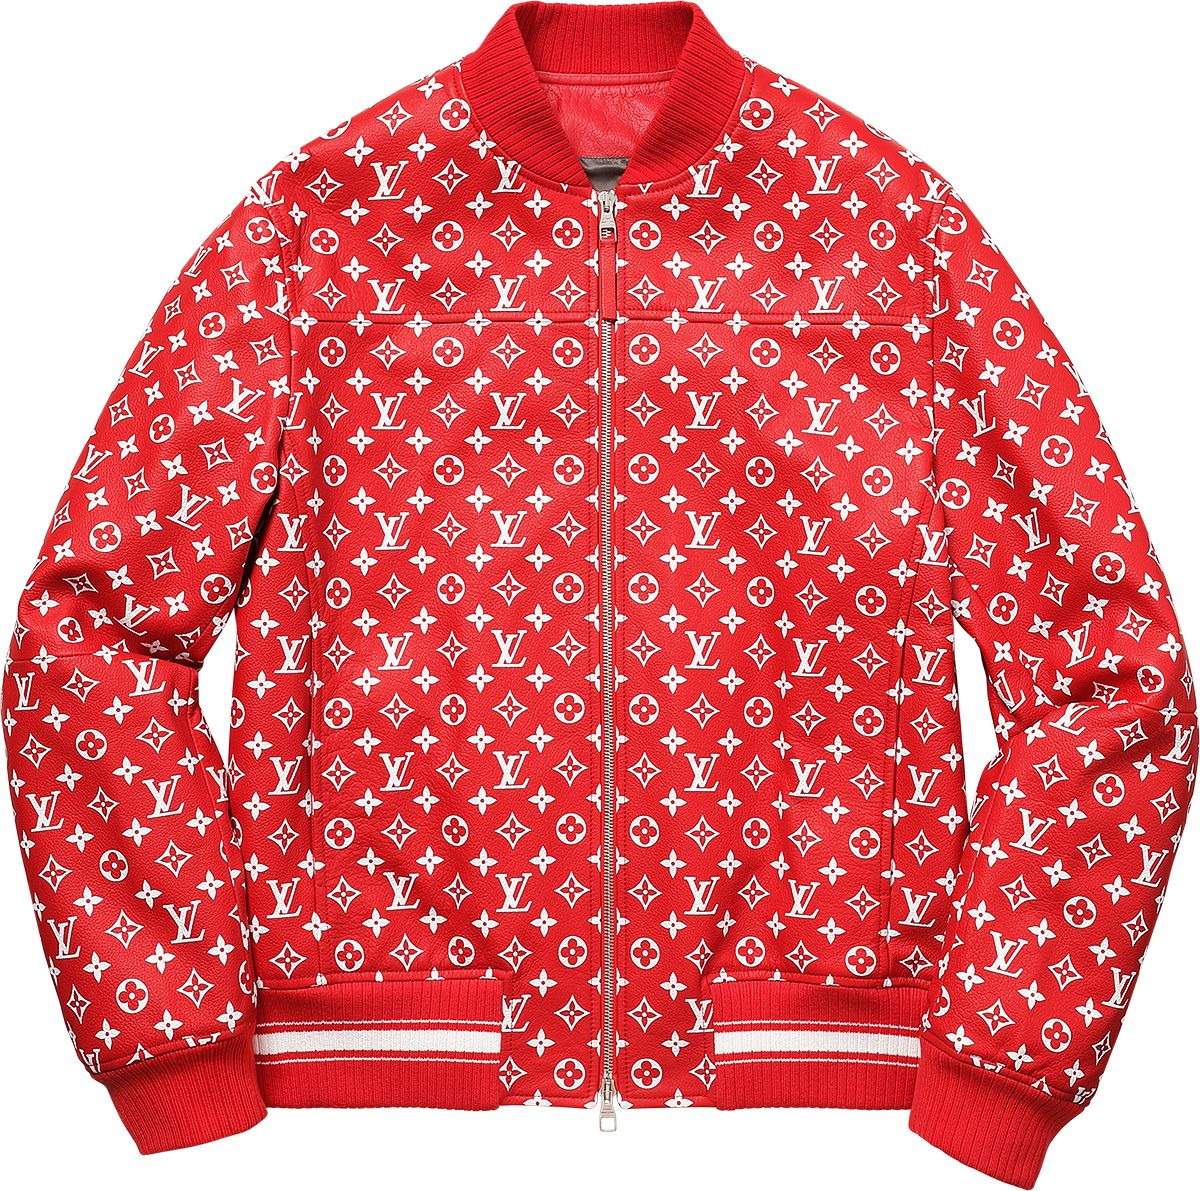 64c10ab76788 Louis Vuitton x Supreme: 8 Jackets for Fall/Winter 2017 - EU Kicks: Sneaker  Magazine